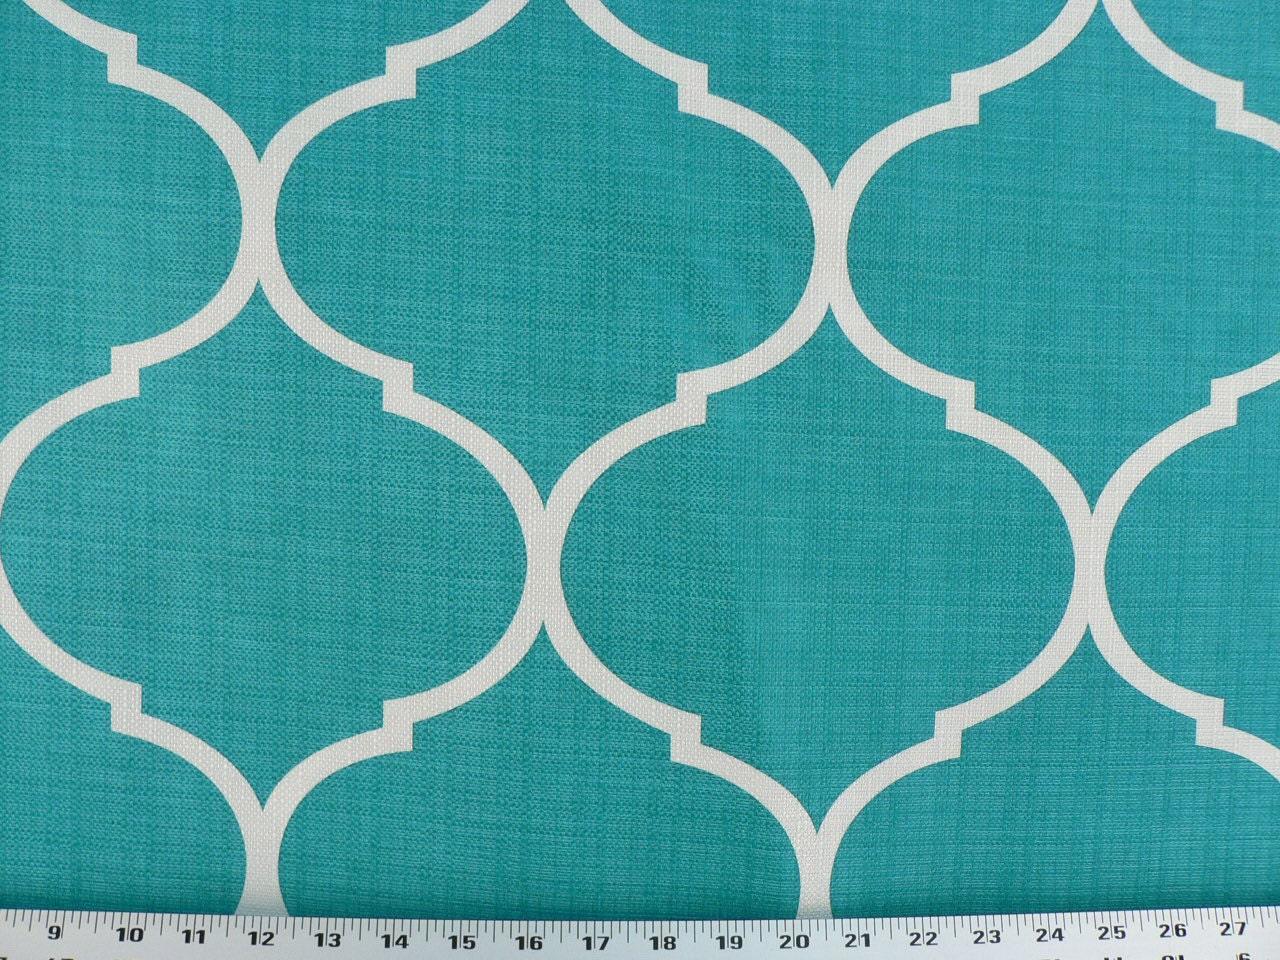 Upholstery Fabric Drapery Fabric Duvet Cover Fabric Slip